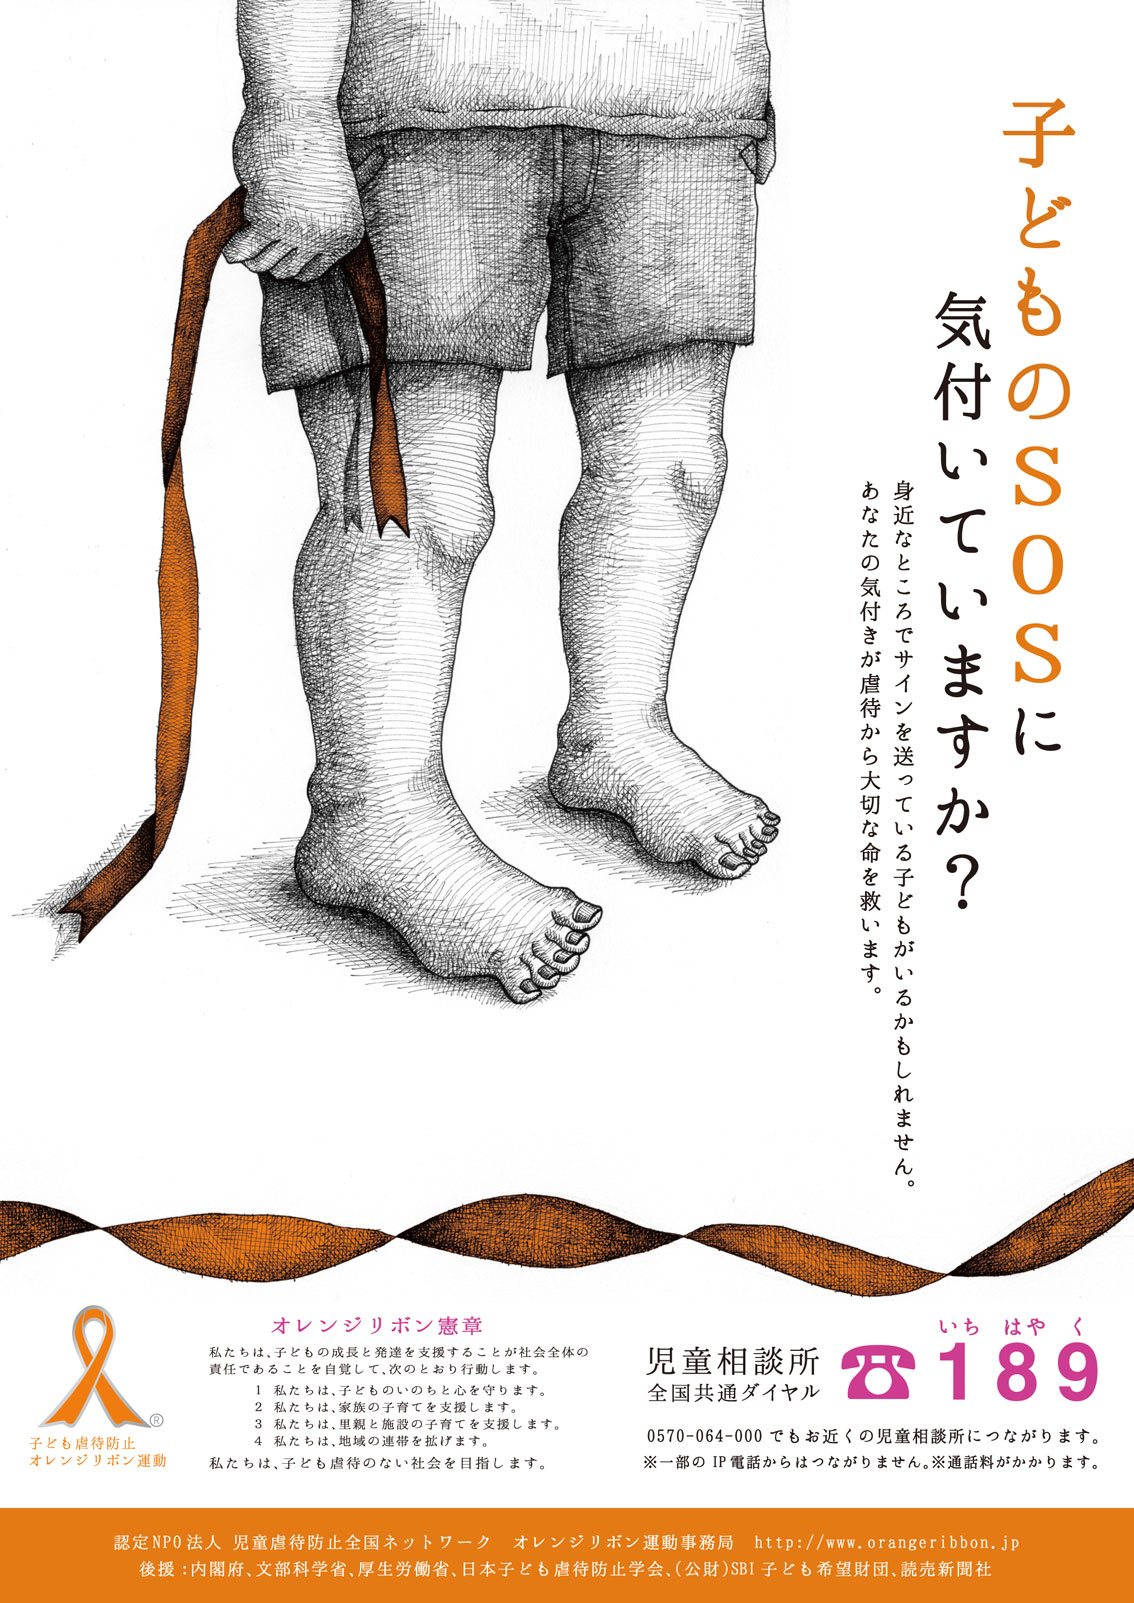 http://www.orangeribbon.jp/info/npo/contest/image/2015contest_daiwa.jpg